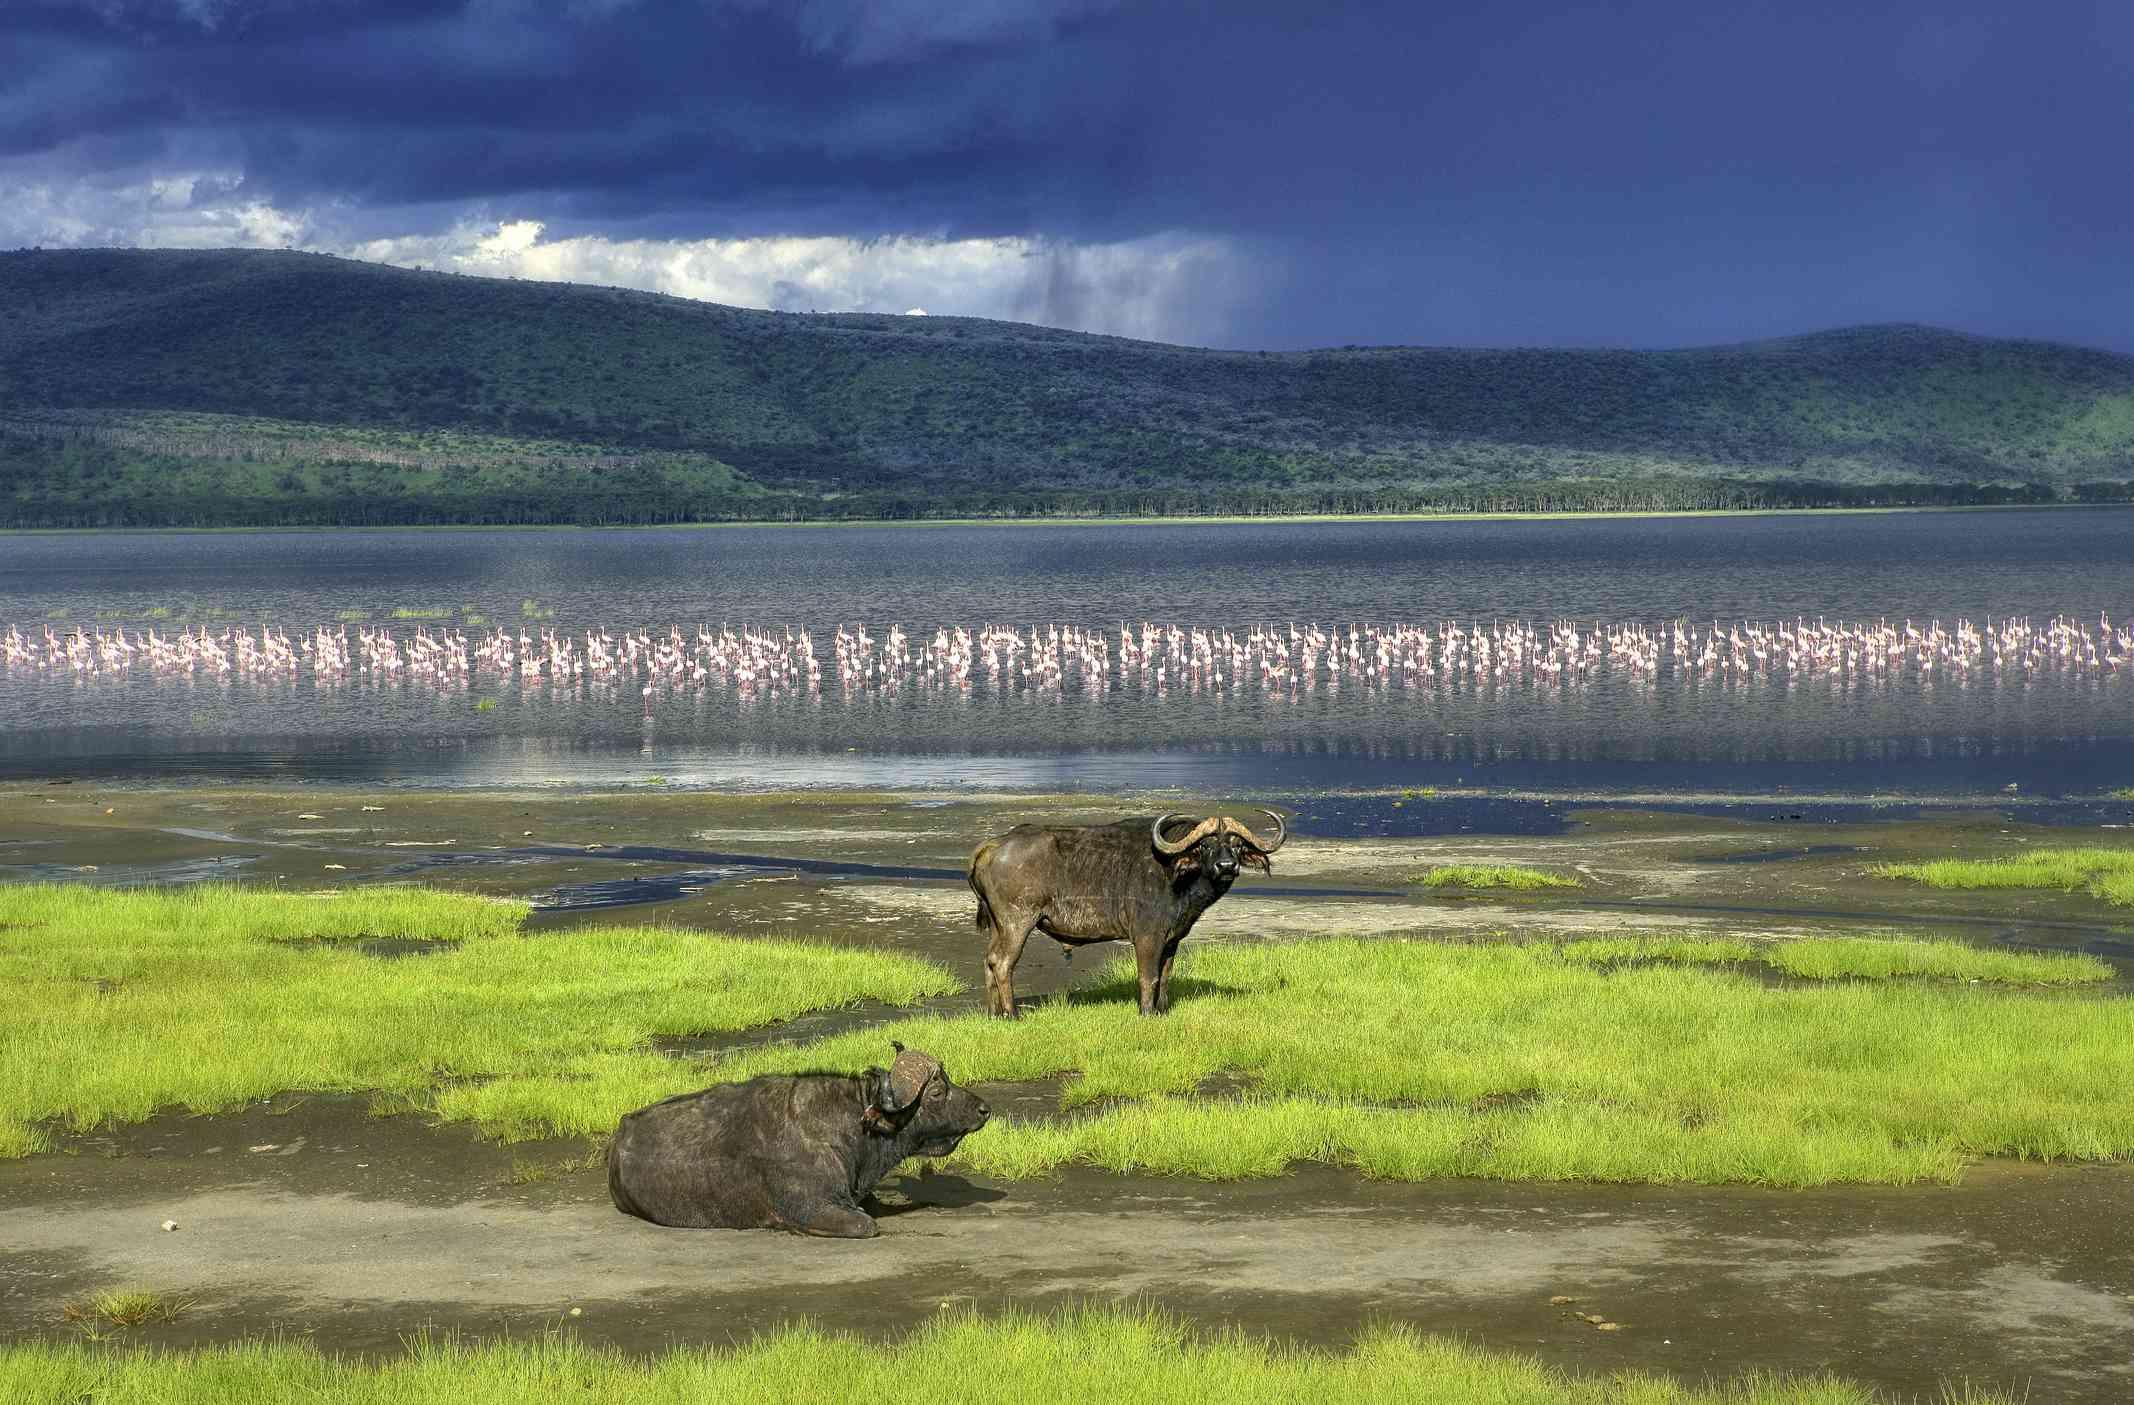 Water buffalo and flamingos in Lake Nakuru.